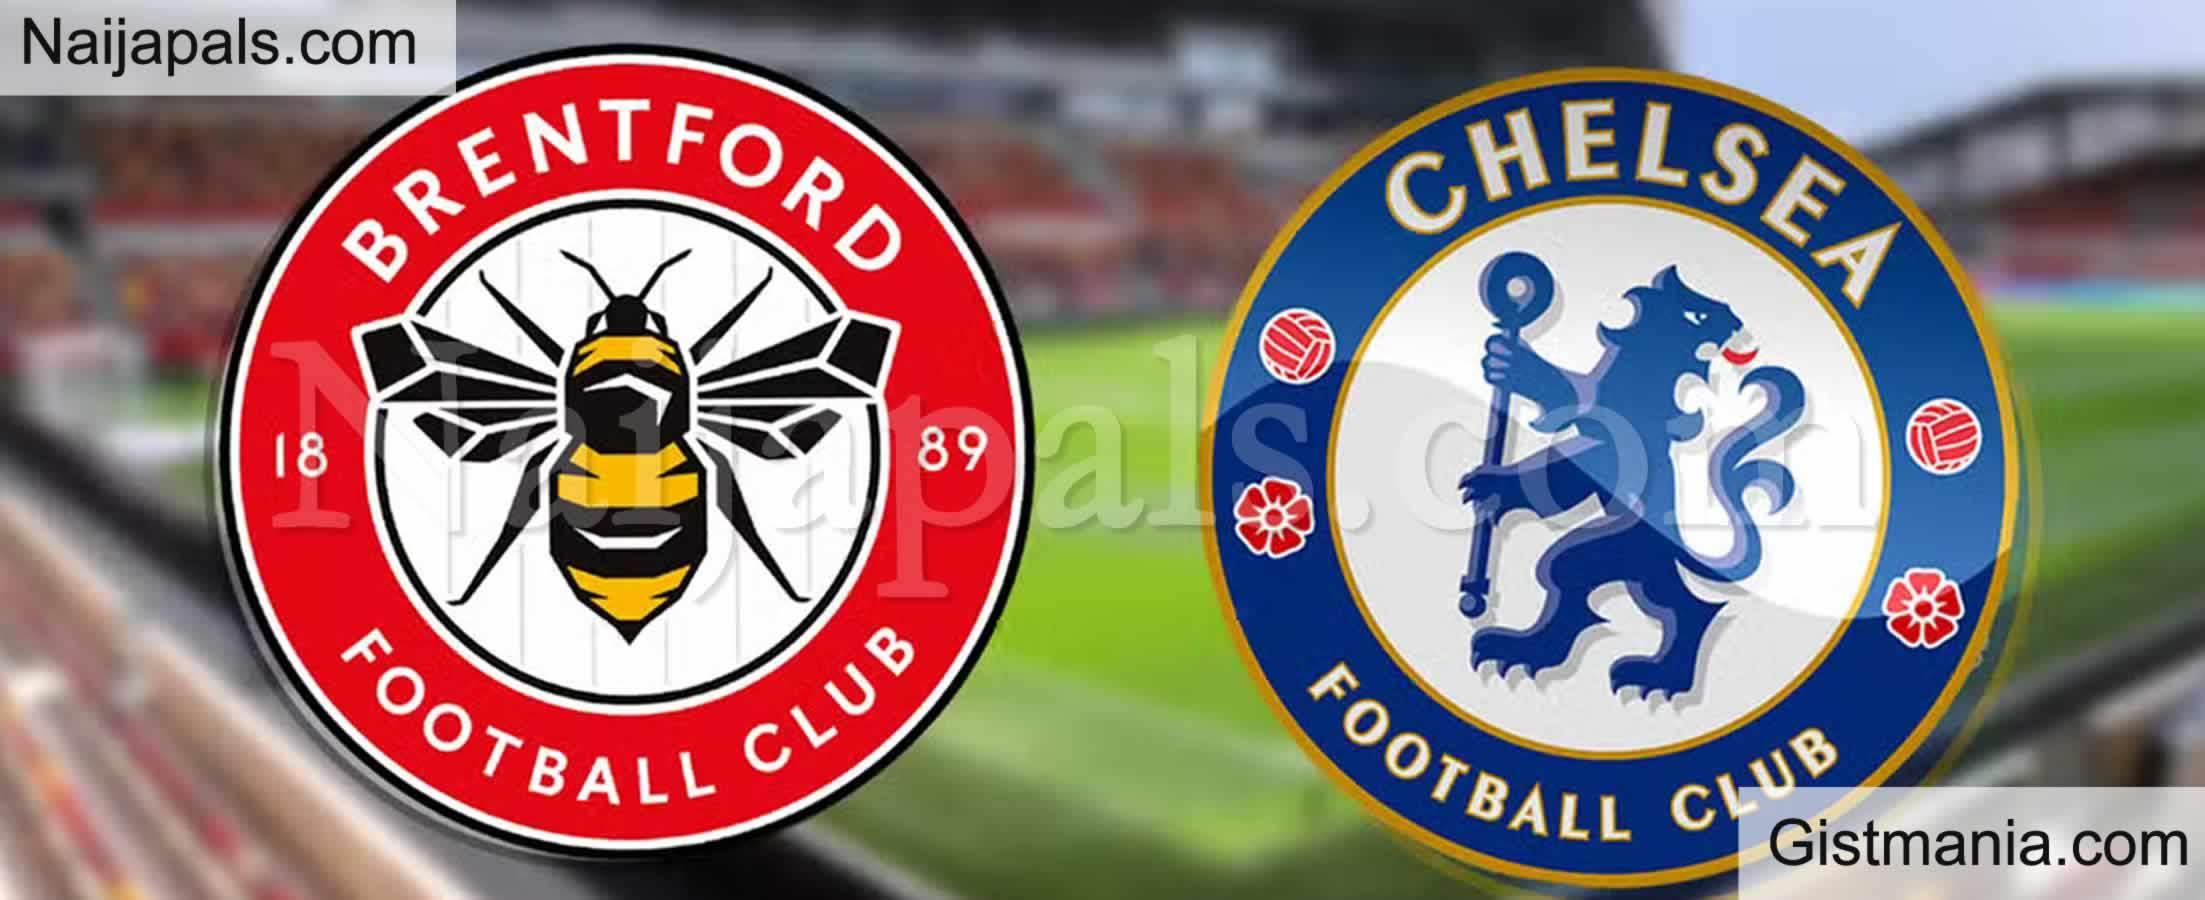 <img alt='.' class='lazyload' data-src='https://img.gistmania.com/emot/soccer.gif' /> <b>Brentford v Chelsea : English Premier League Match, Team News, Goal Scorers and Stats</b>